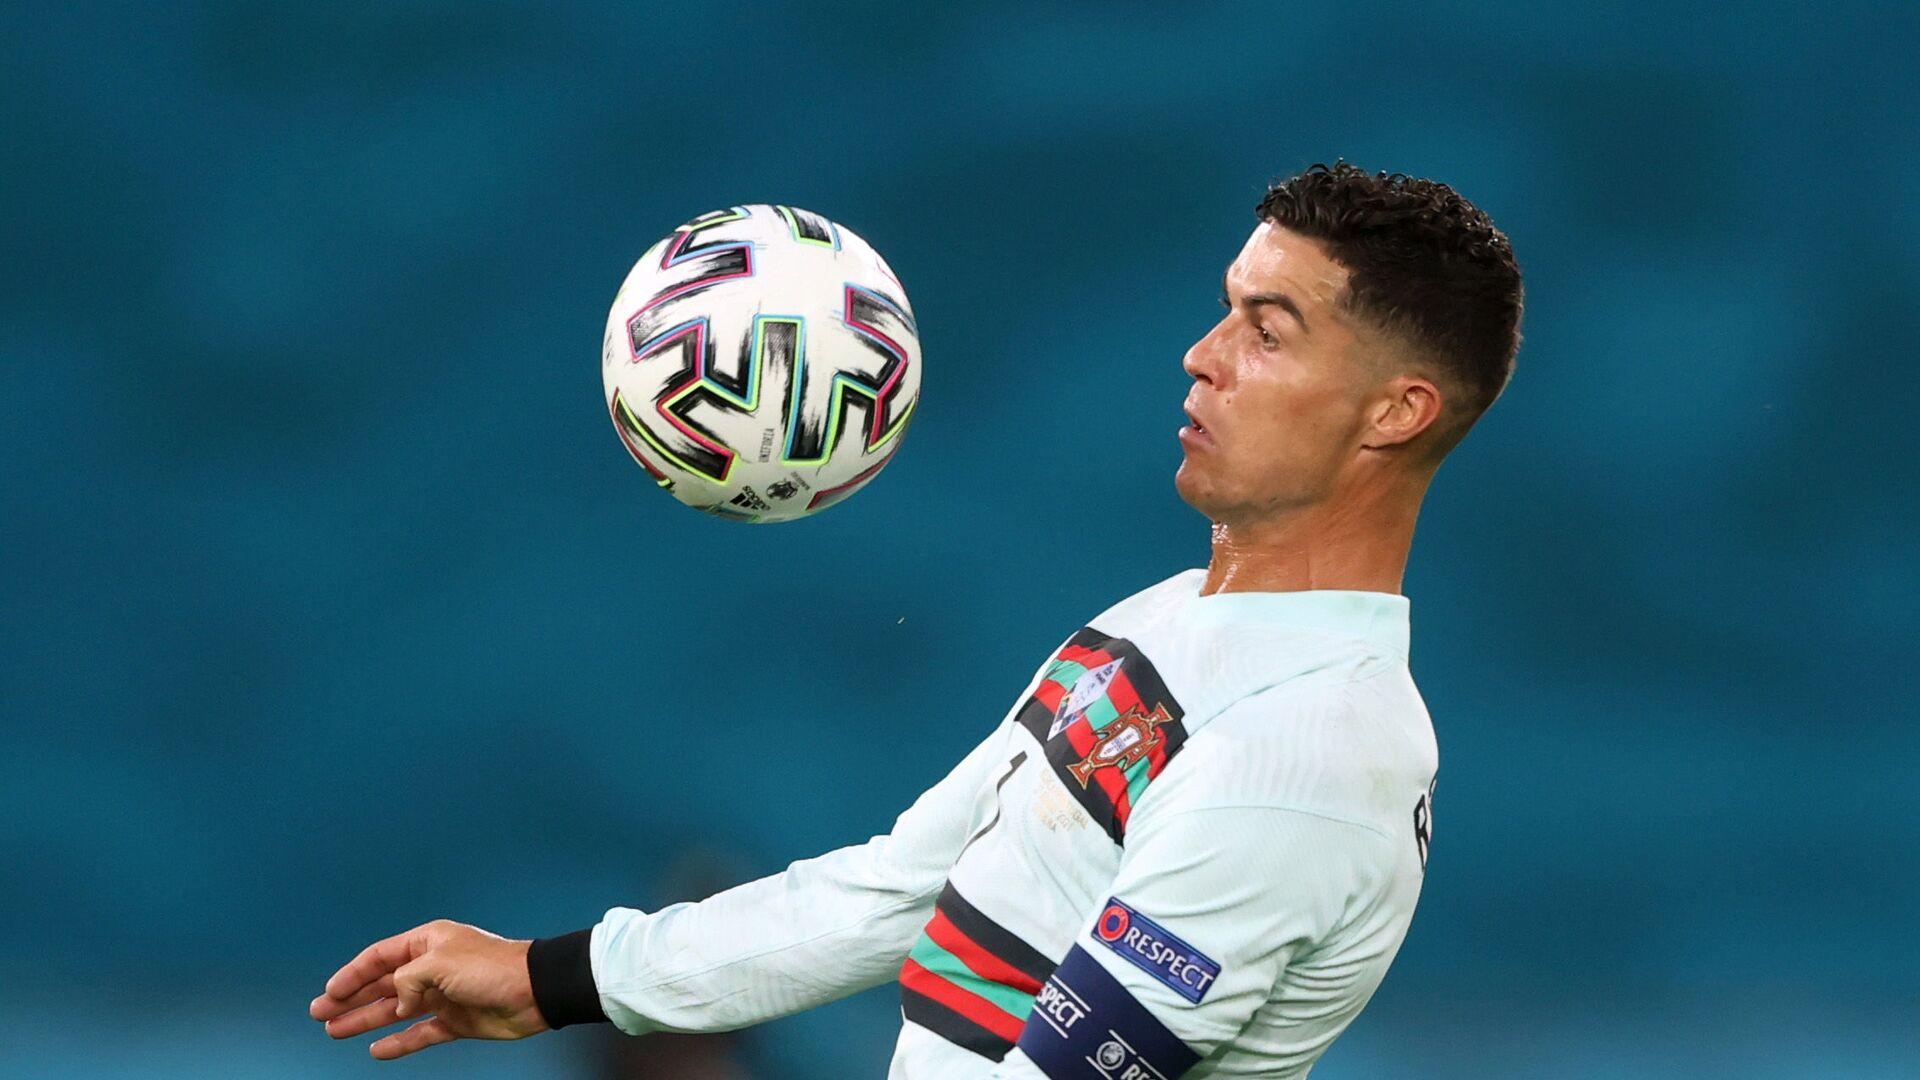 Cristiano Ronaldo na EURO 2020 v zápase proti Belgii - Sputnik Česká republika, 1920, 31.08.2021